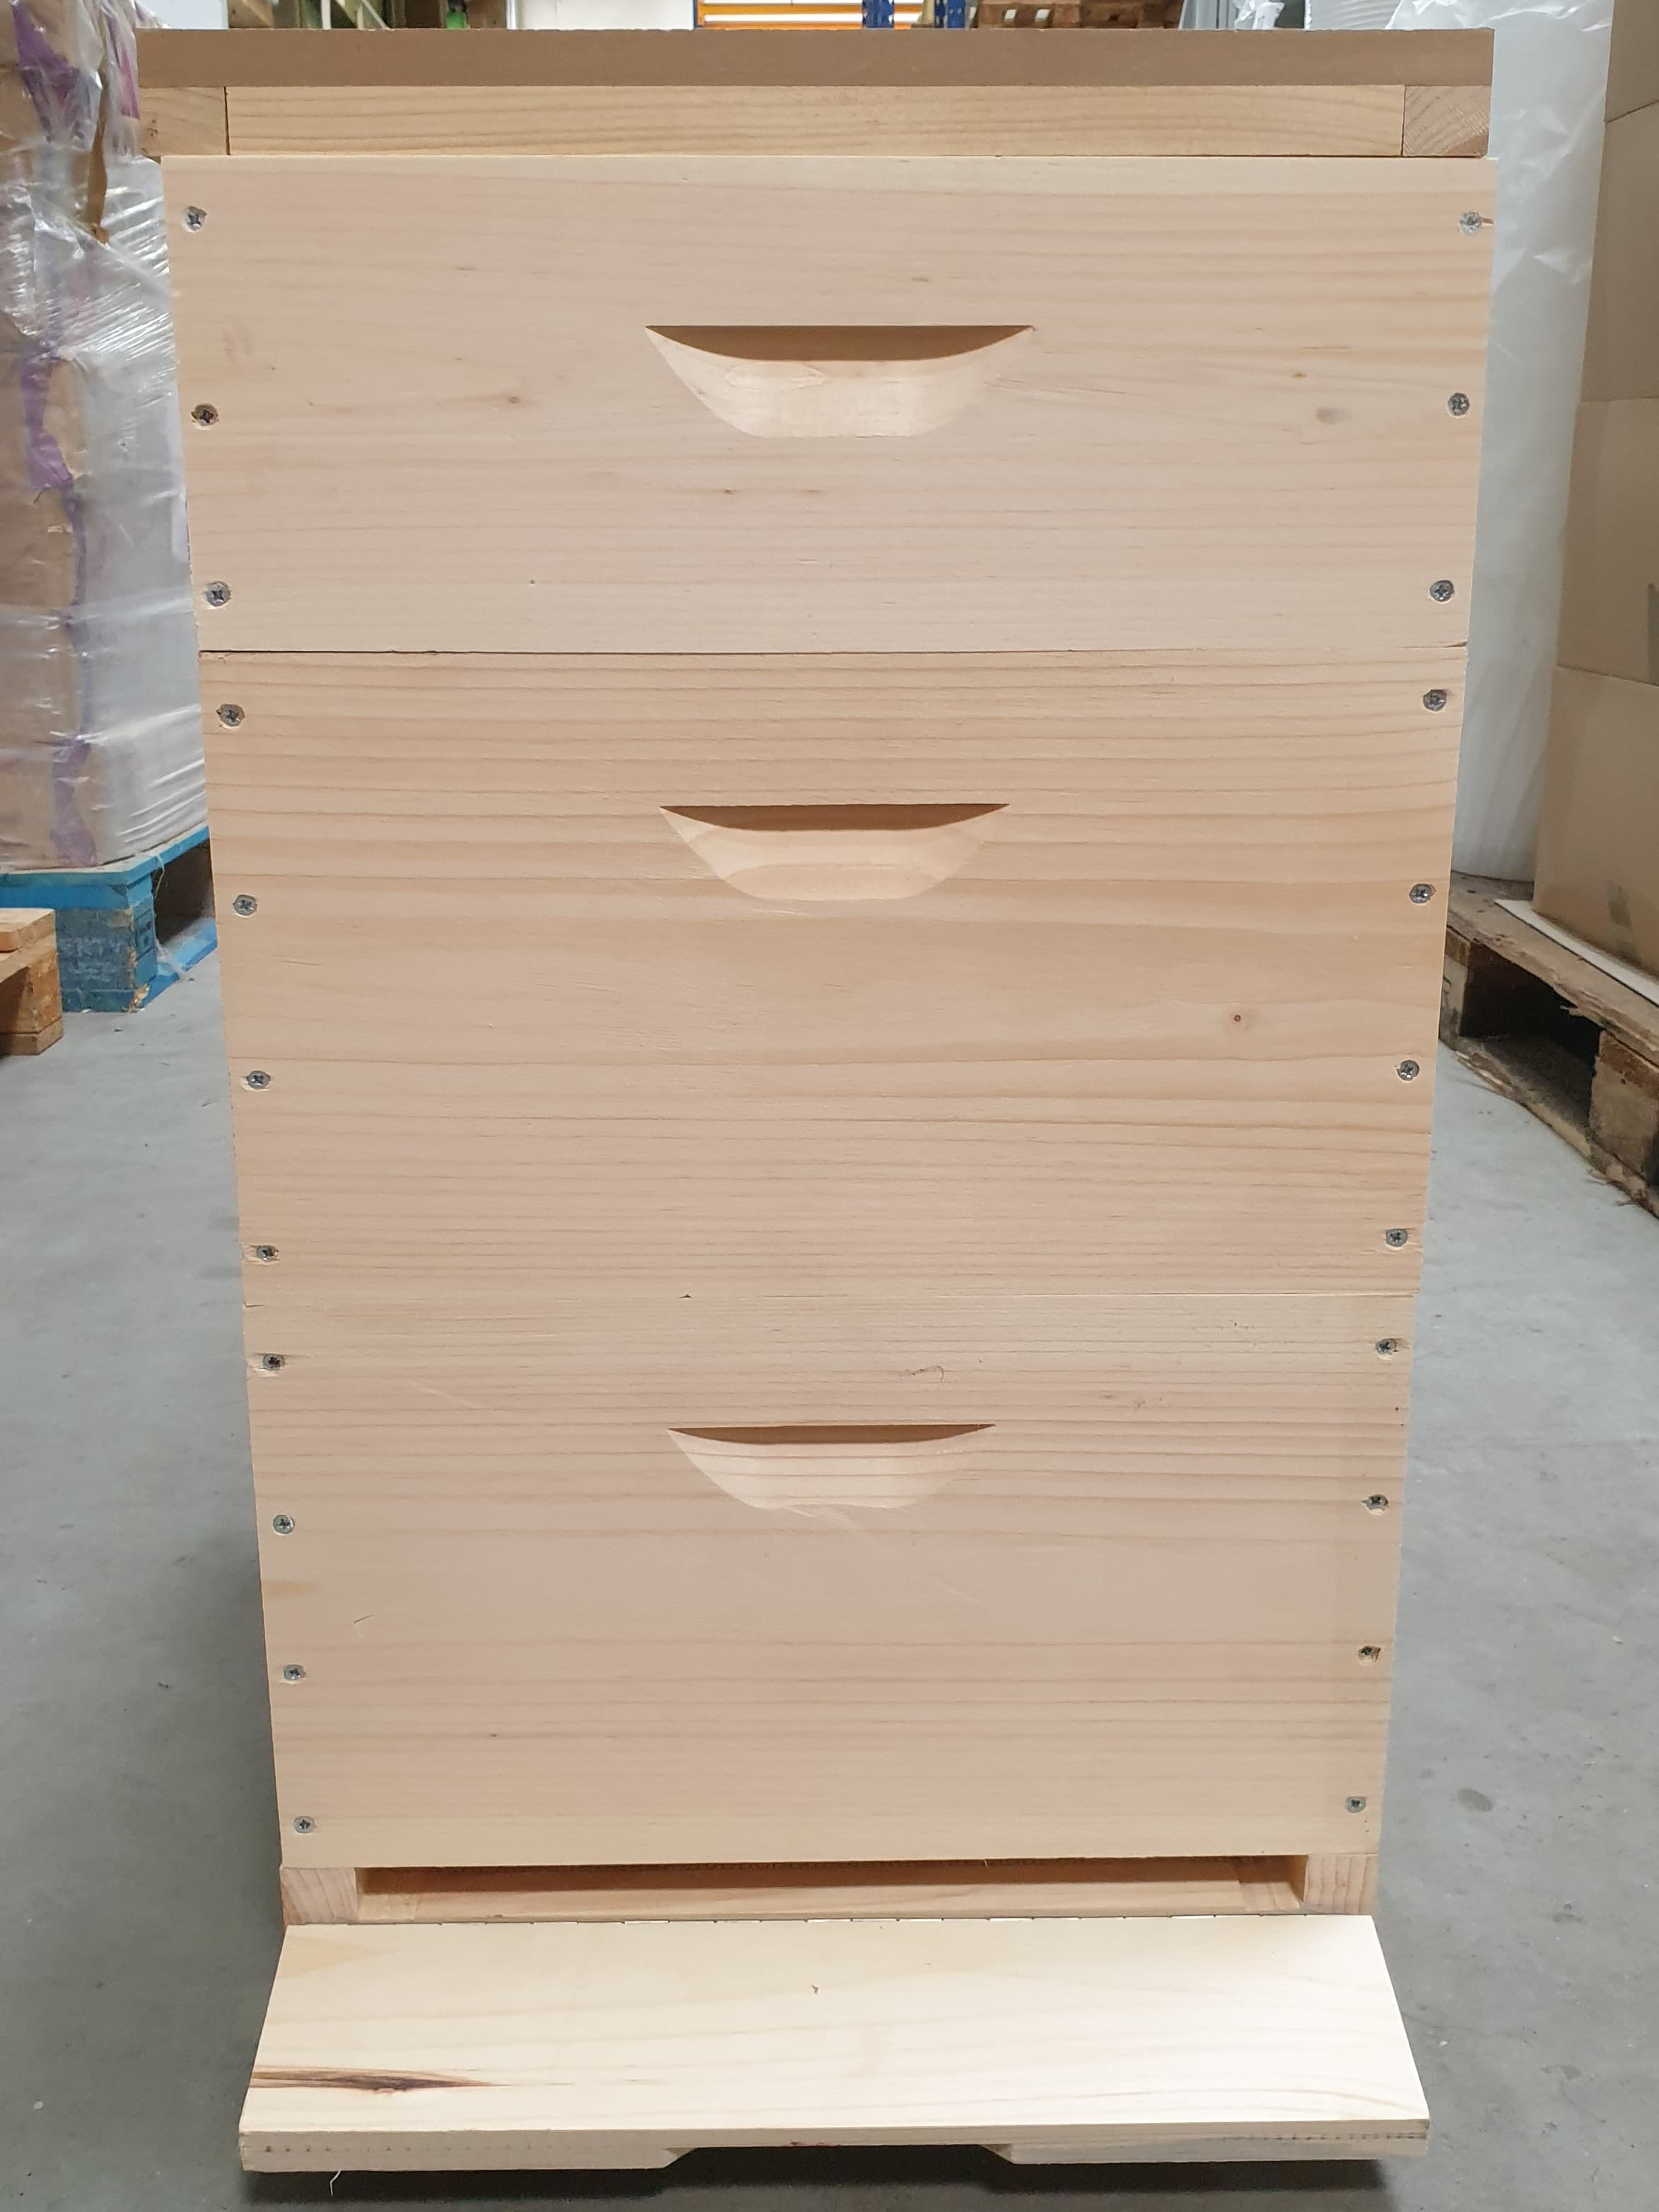 Simplexholzbeute: 1 Boden, 2 Br.-Zargen, 1Ho-Zarge, 1 Deckel